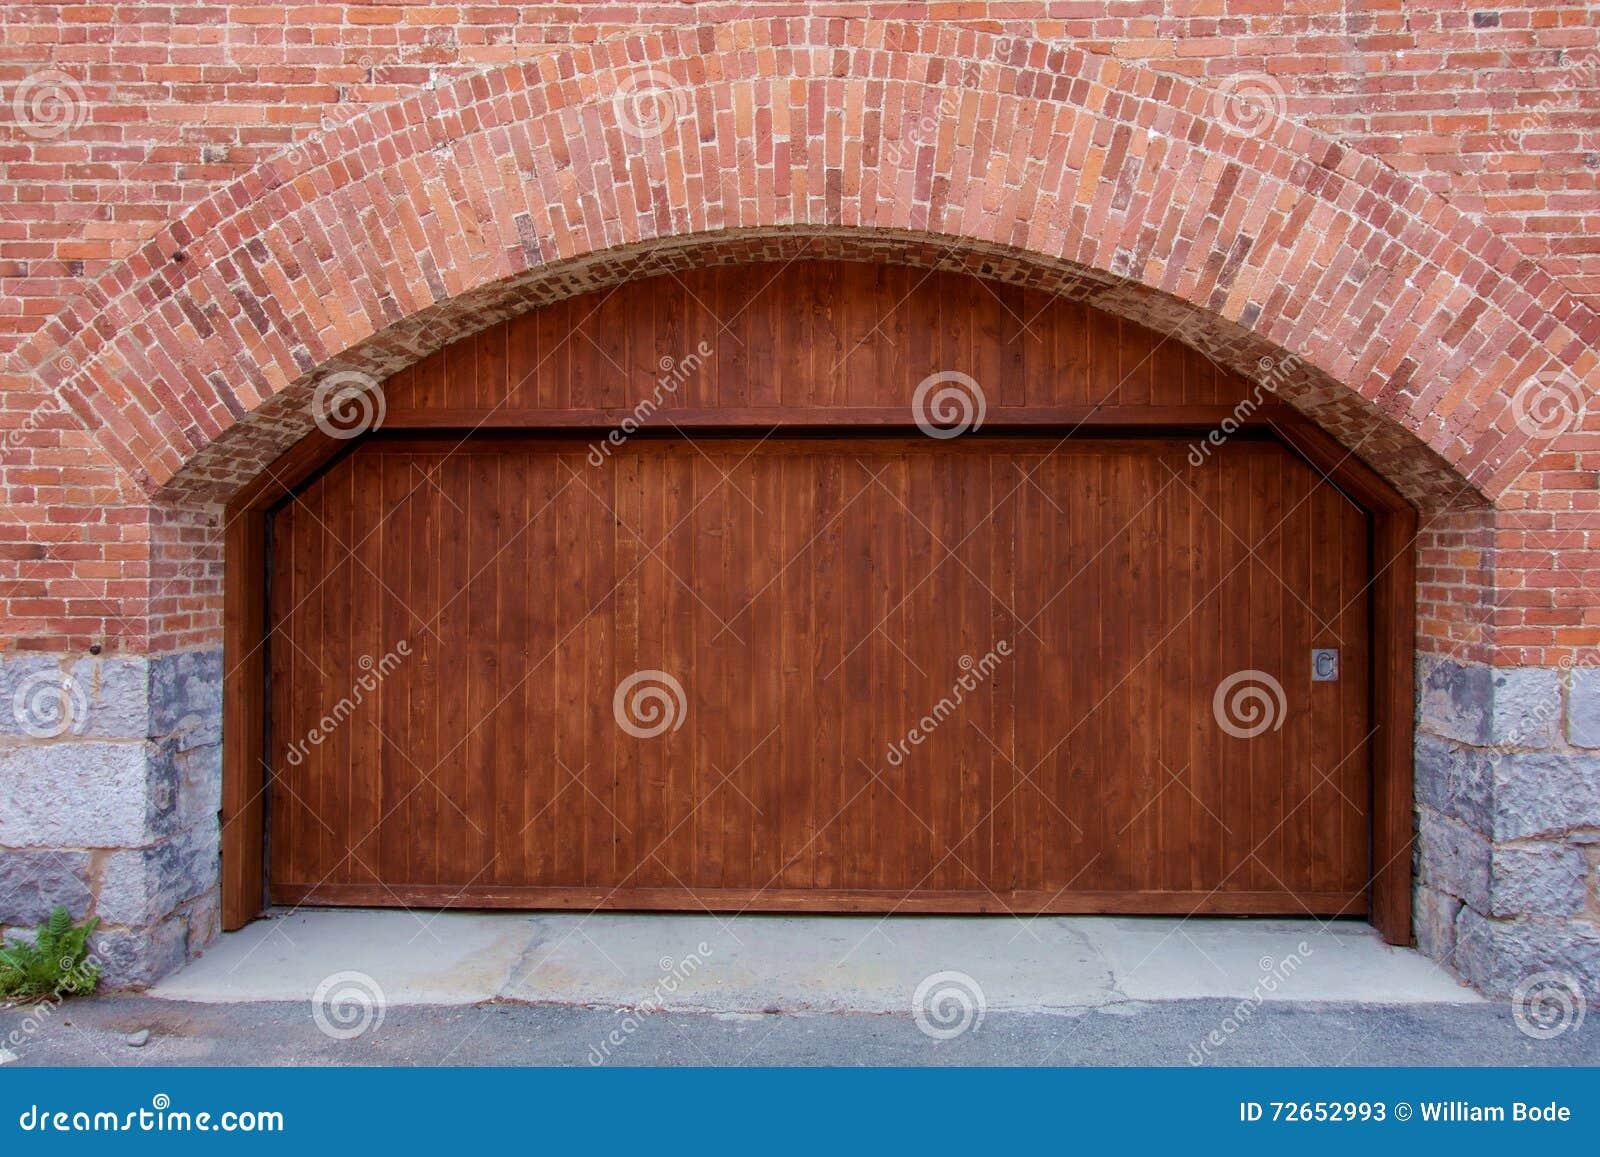 how to make large wooden garage doors